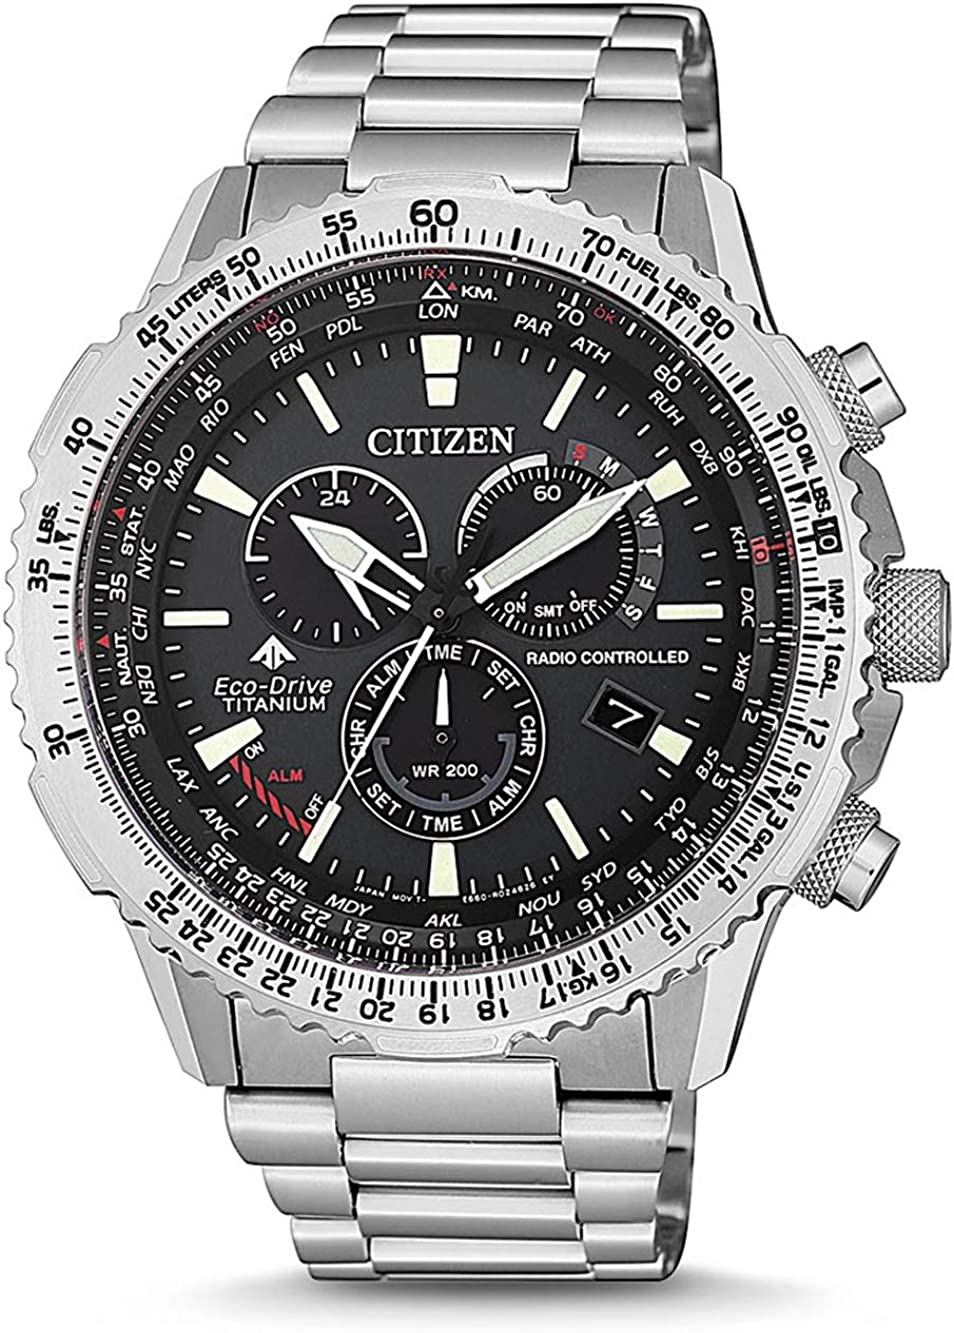 Reloj Citizen Radiocontrolado Crono Pilot Super Titanium